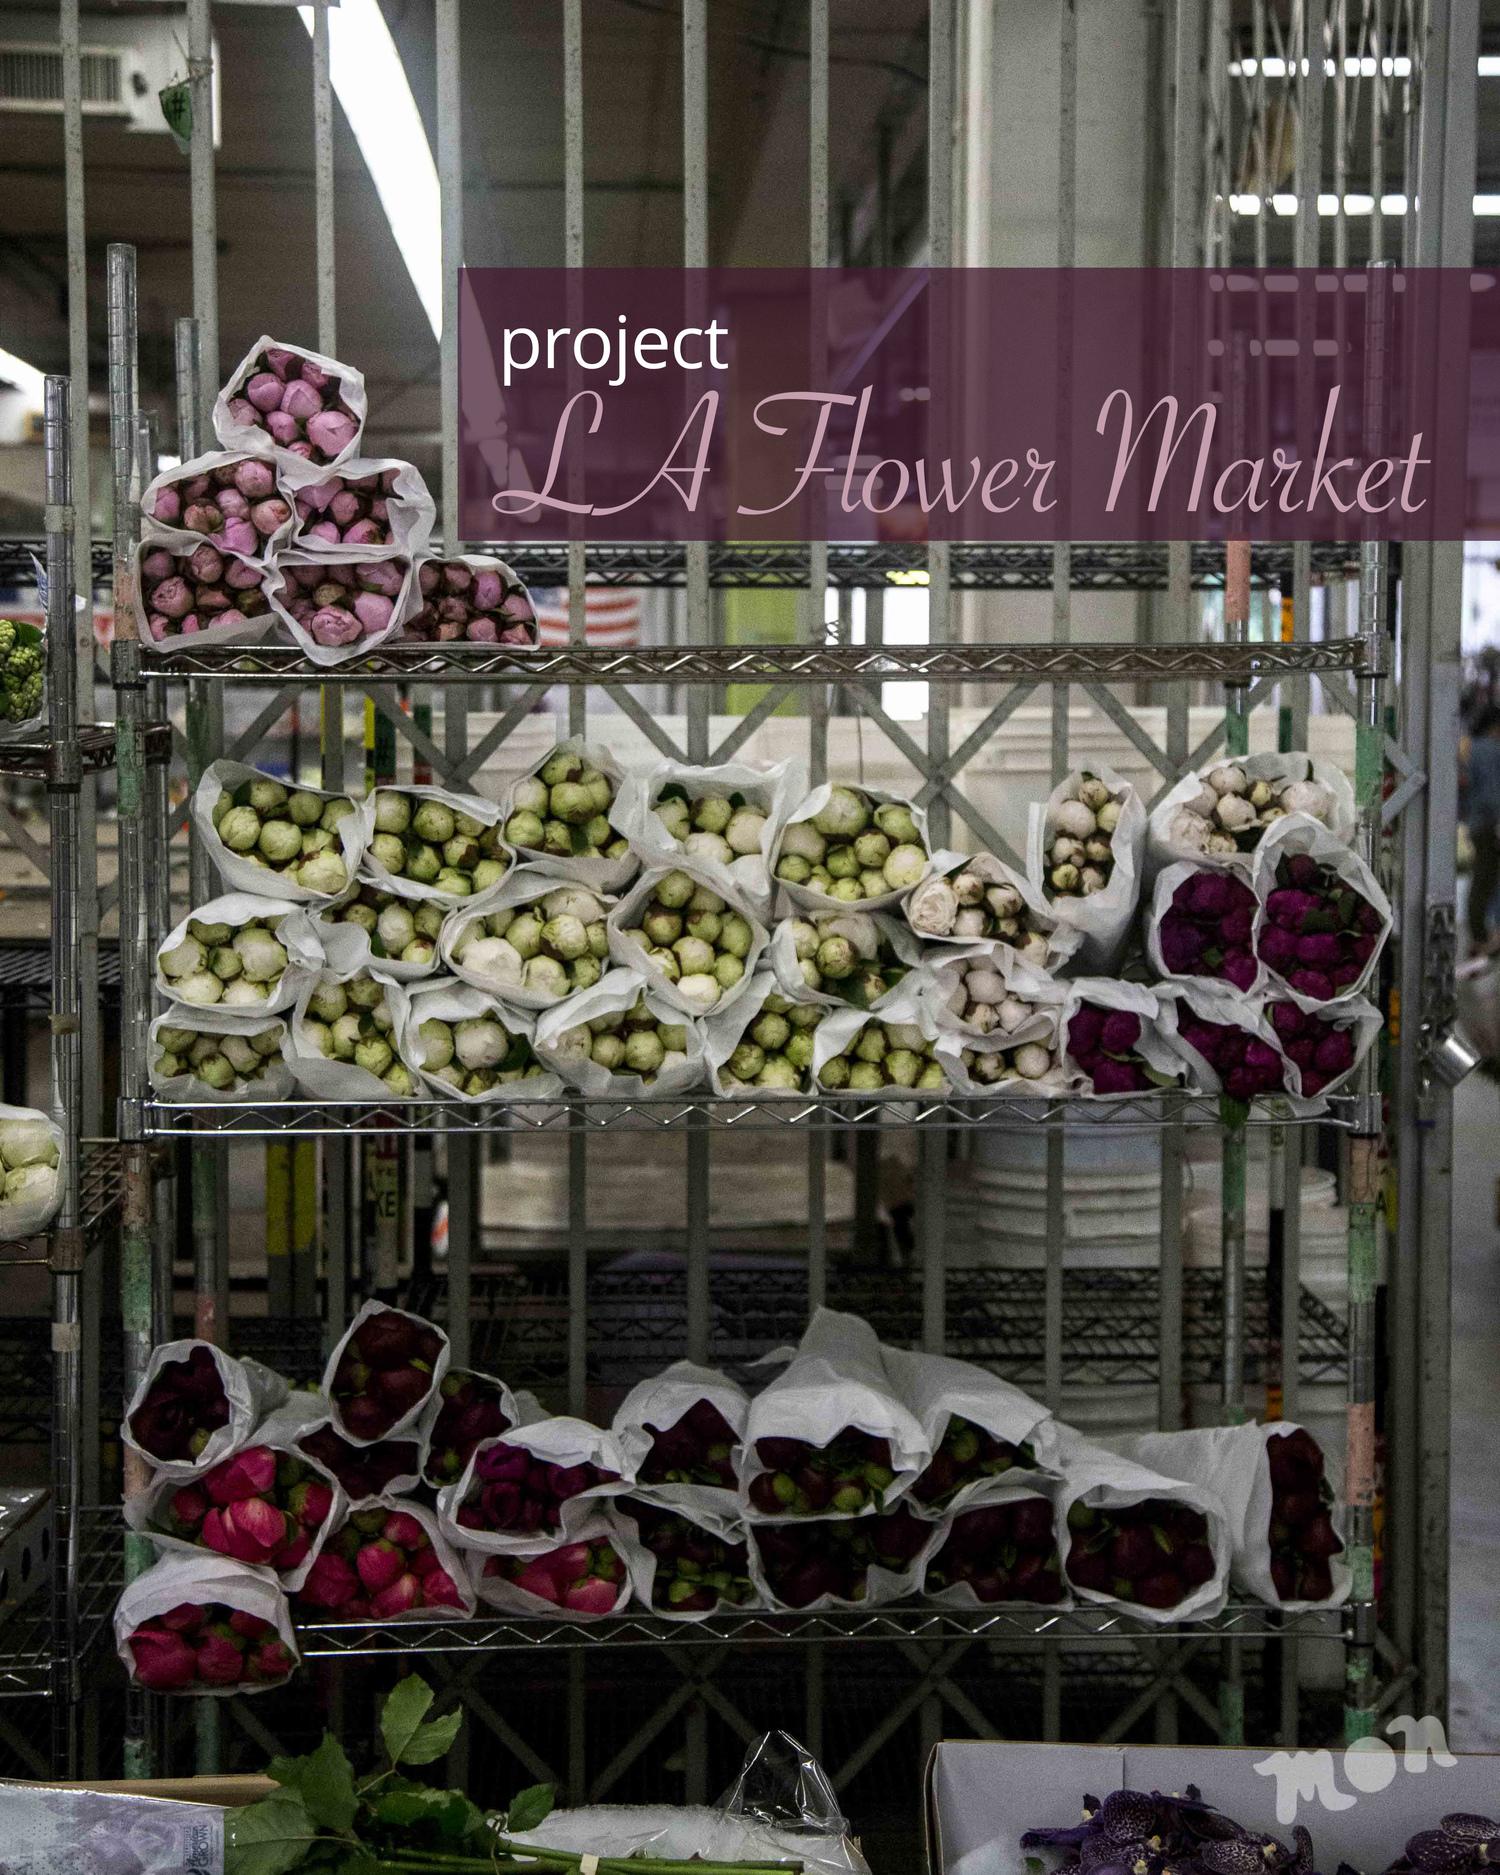 Project La Flower Market The Monday Project